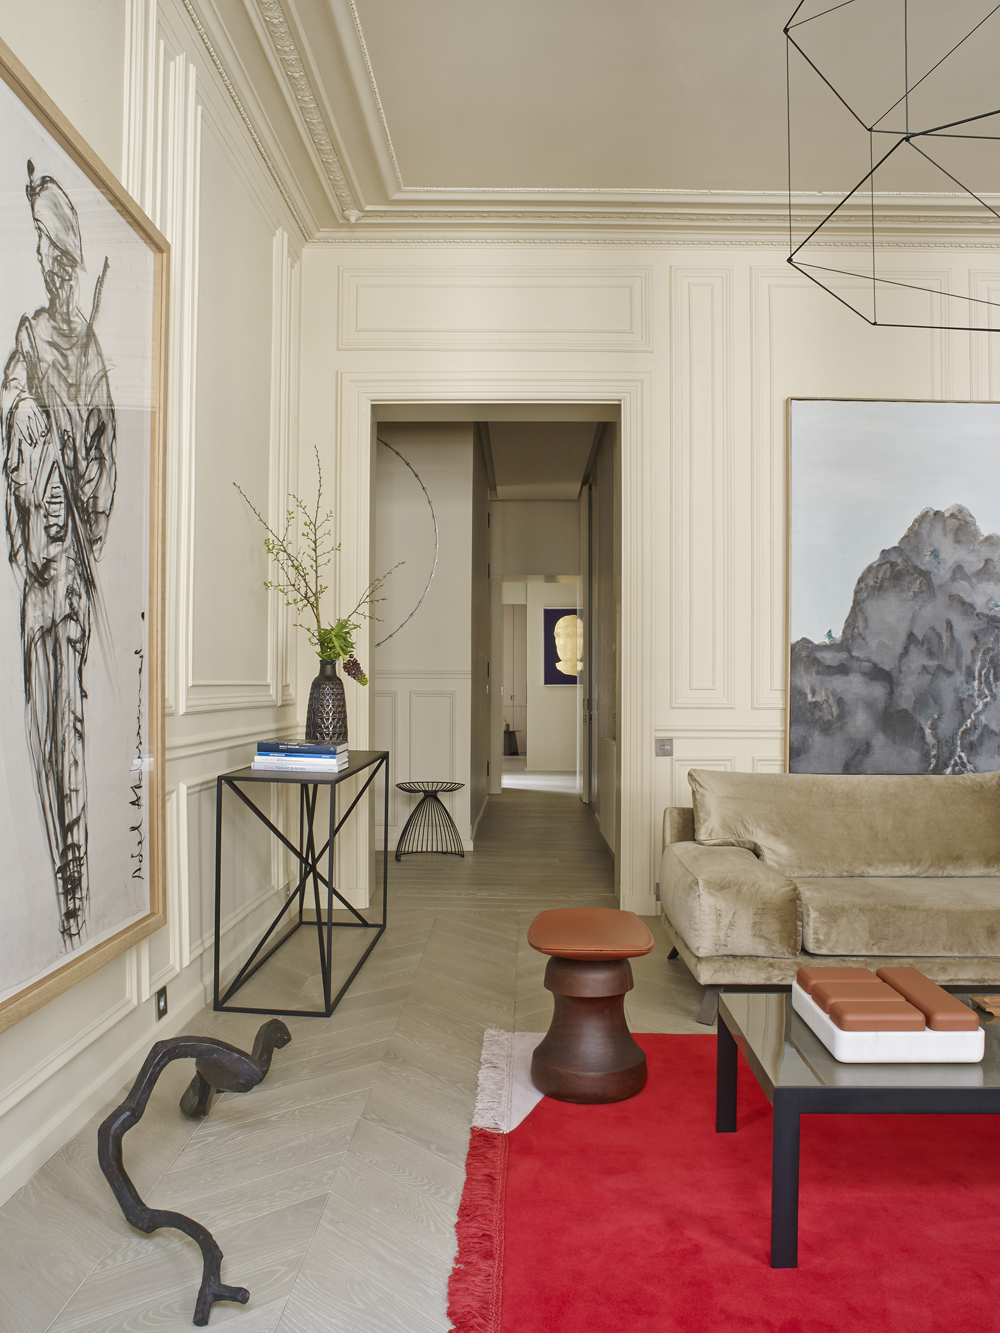 christophe-delcourt-interior-inspiration-6.jpg